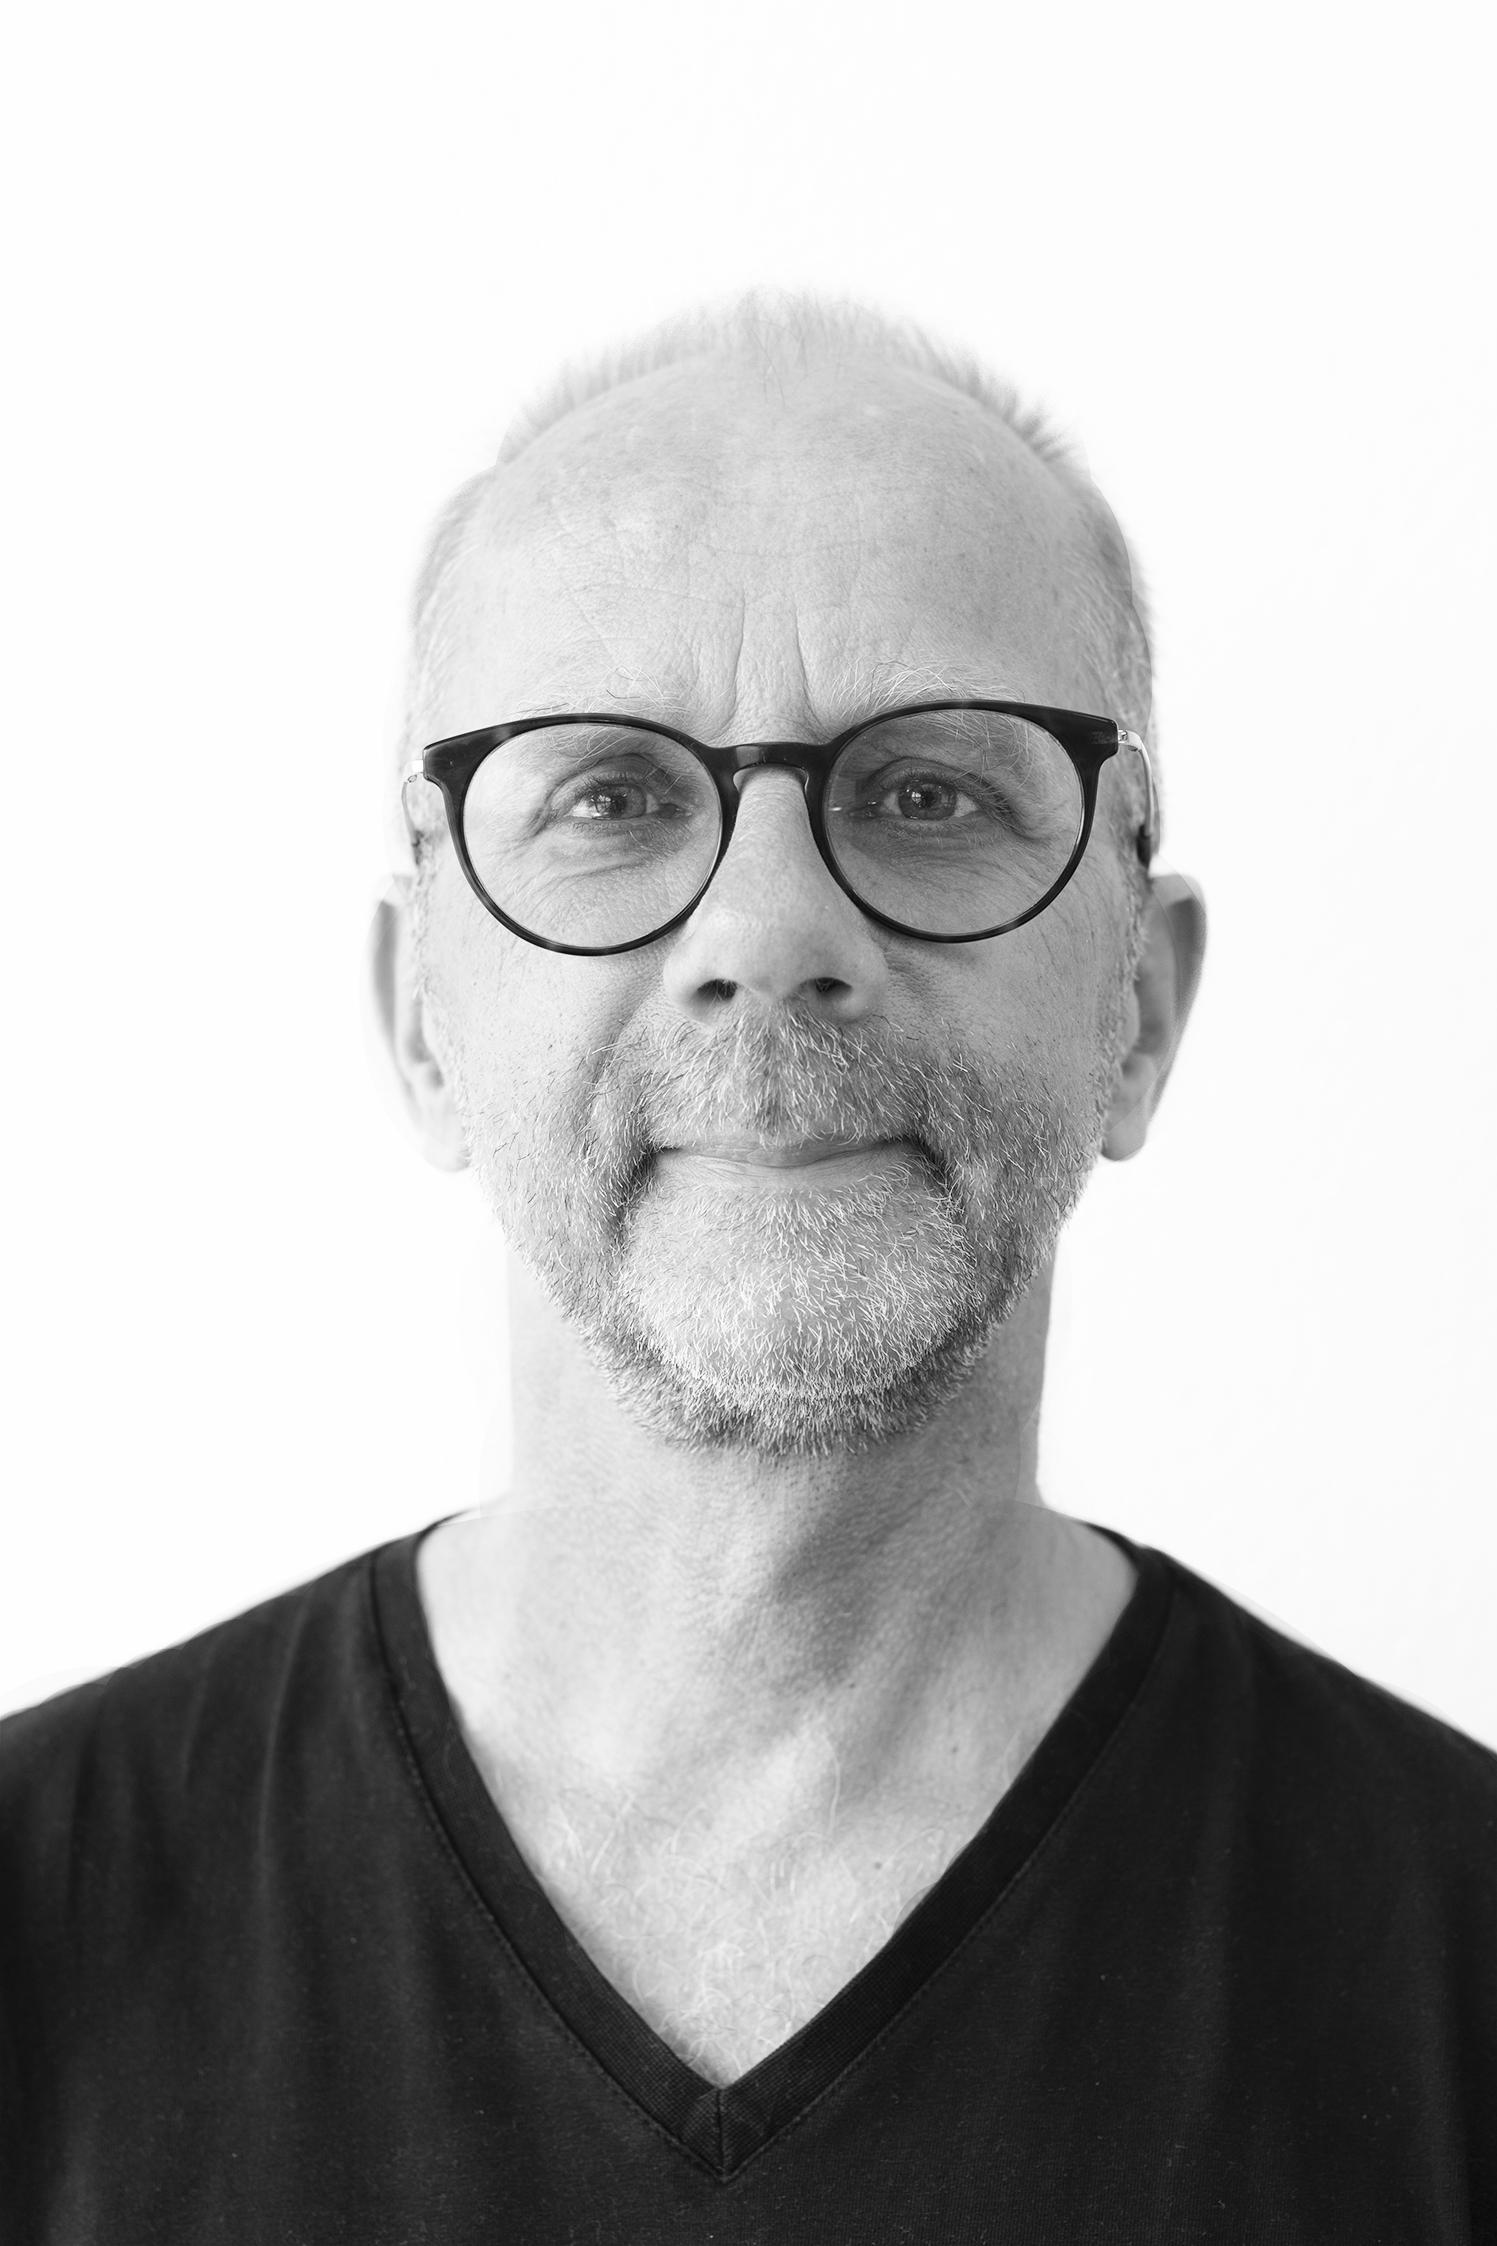 Robert Hoeksema